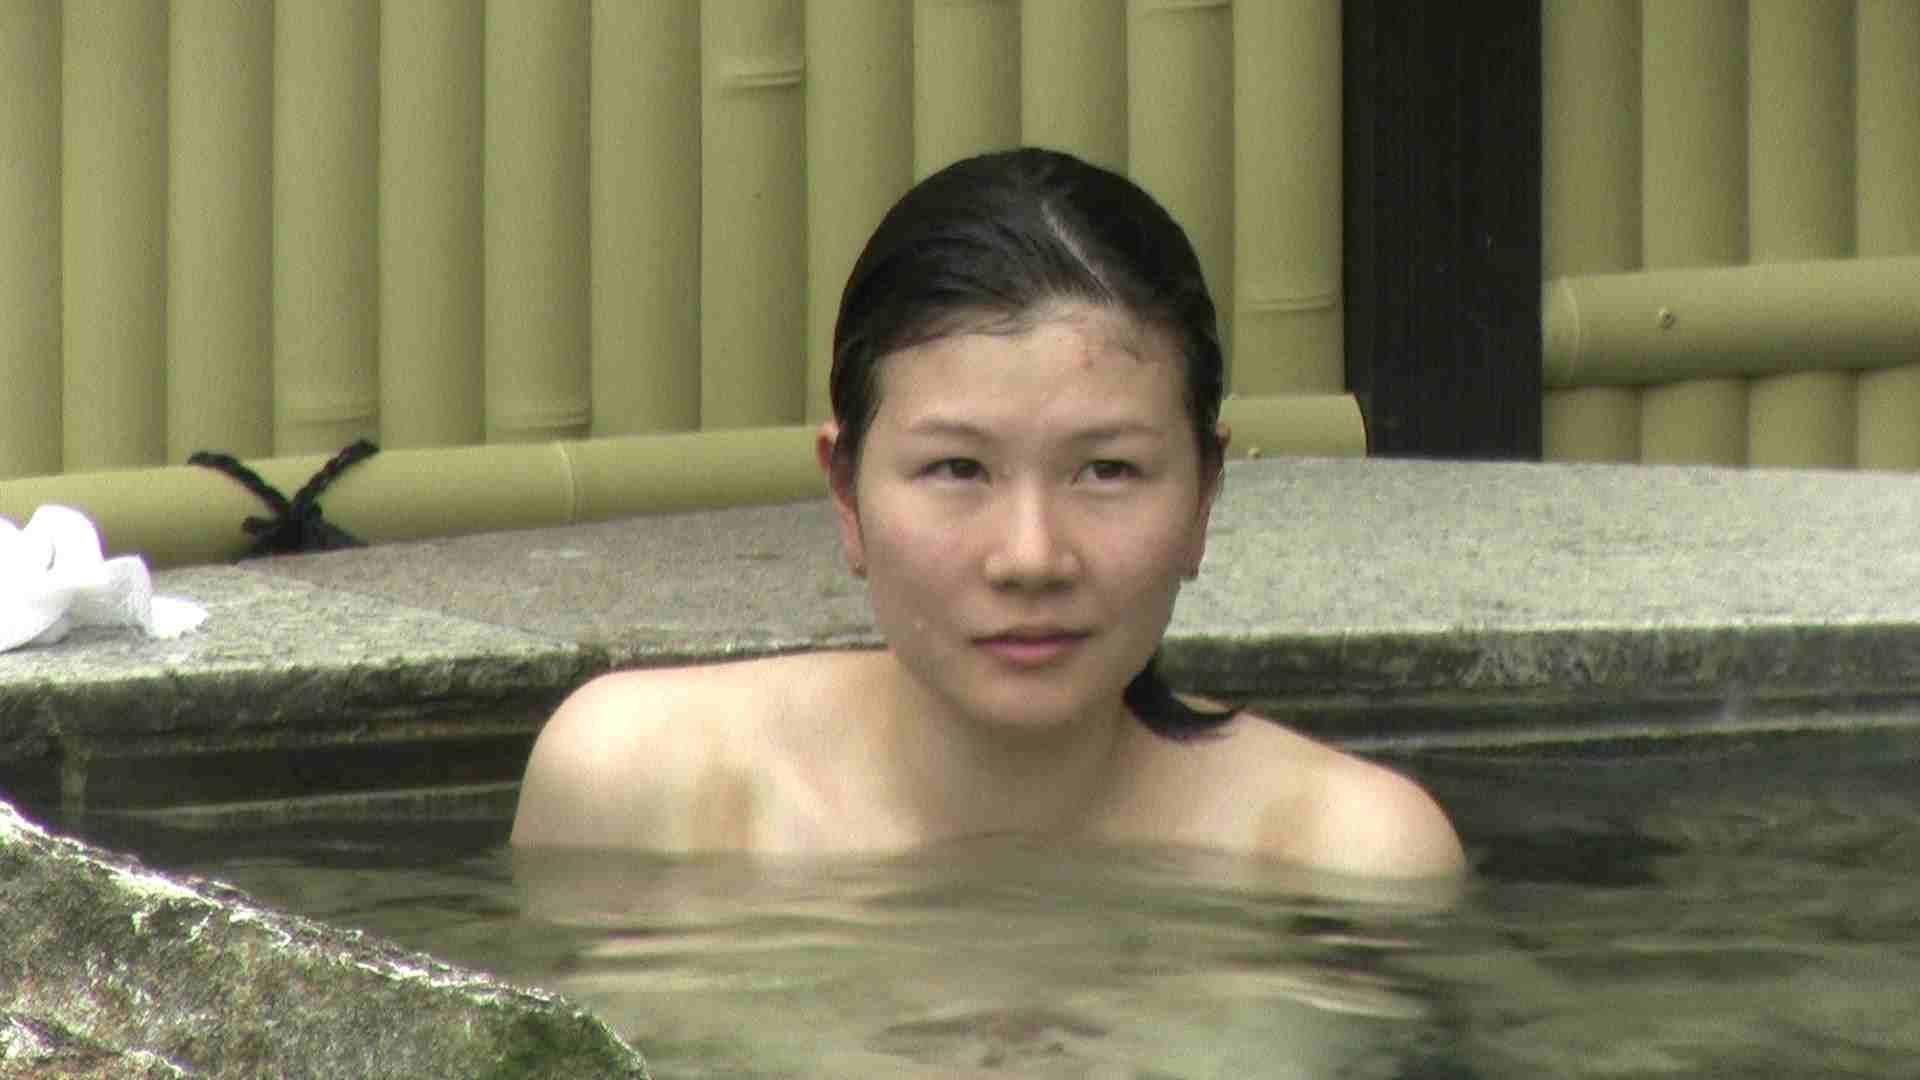 Aquaな露天風呂Vol.187 盗撮映像  99Pix 28